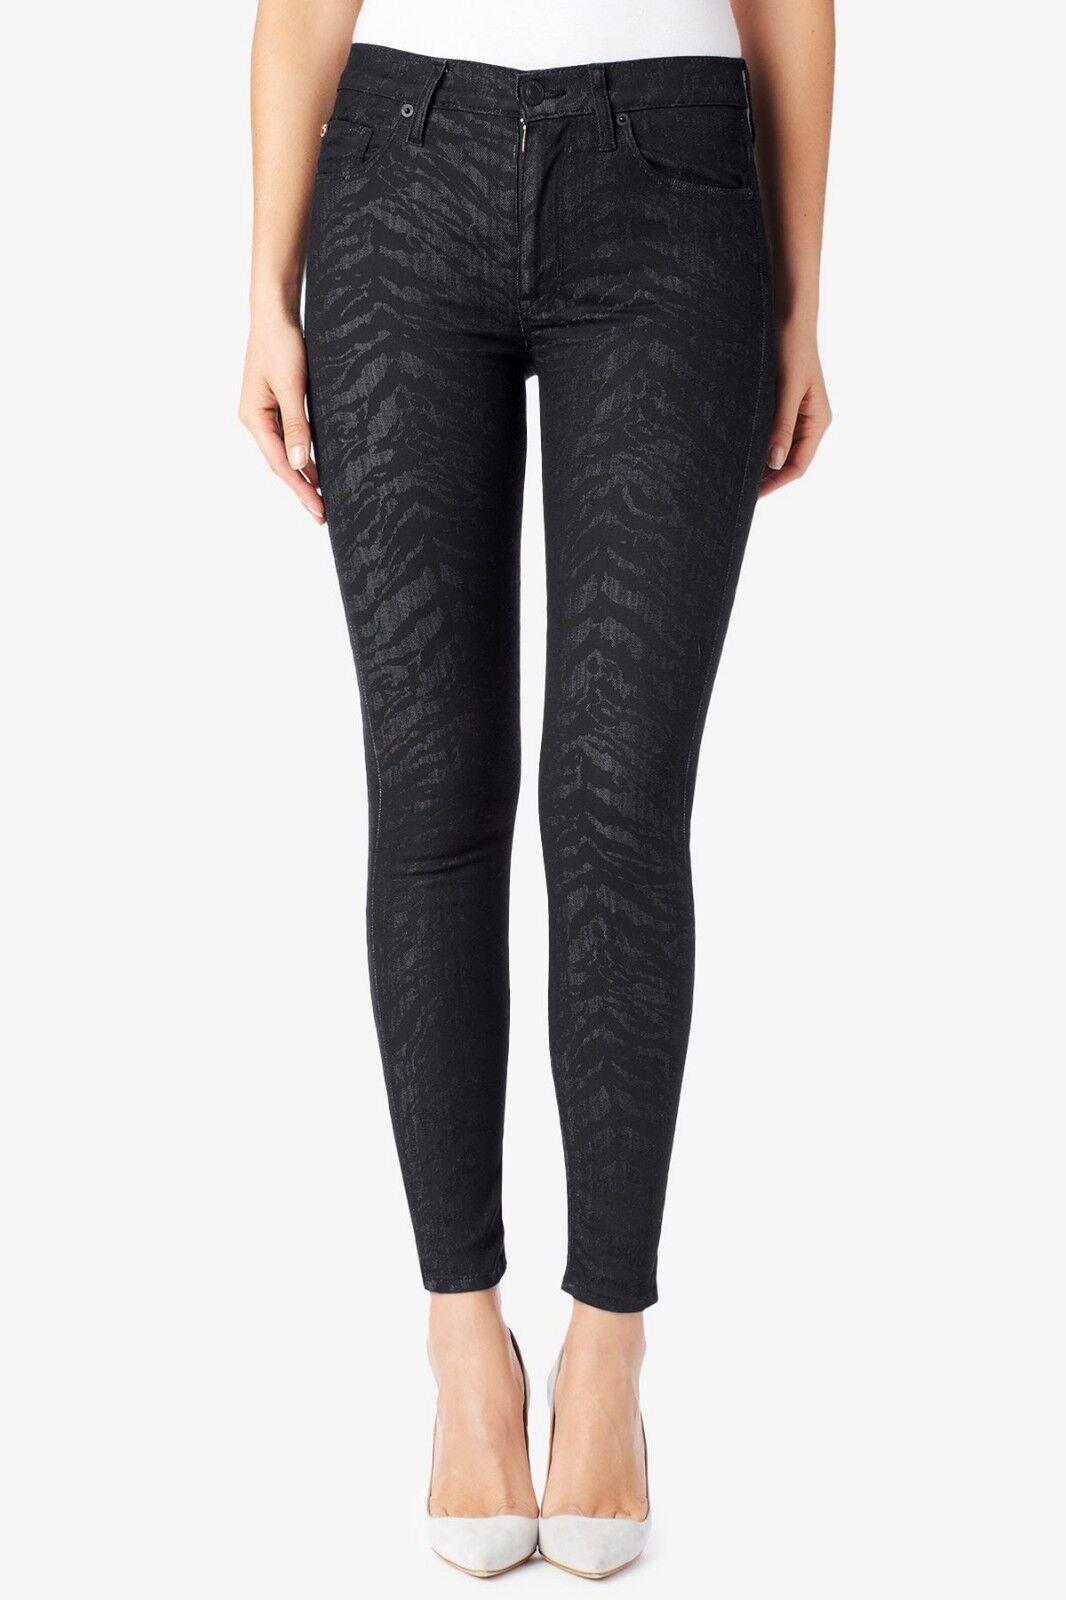 New Hudson Barbara High waist super skinny ankle Jeans Size 26